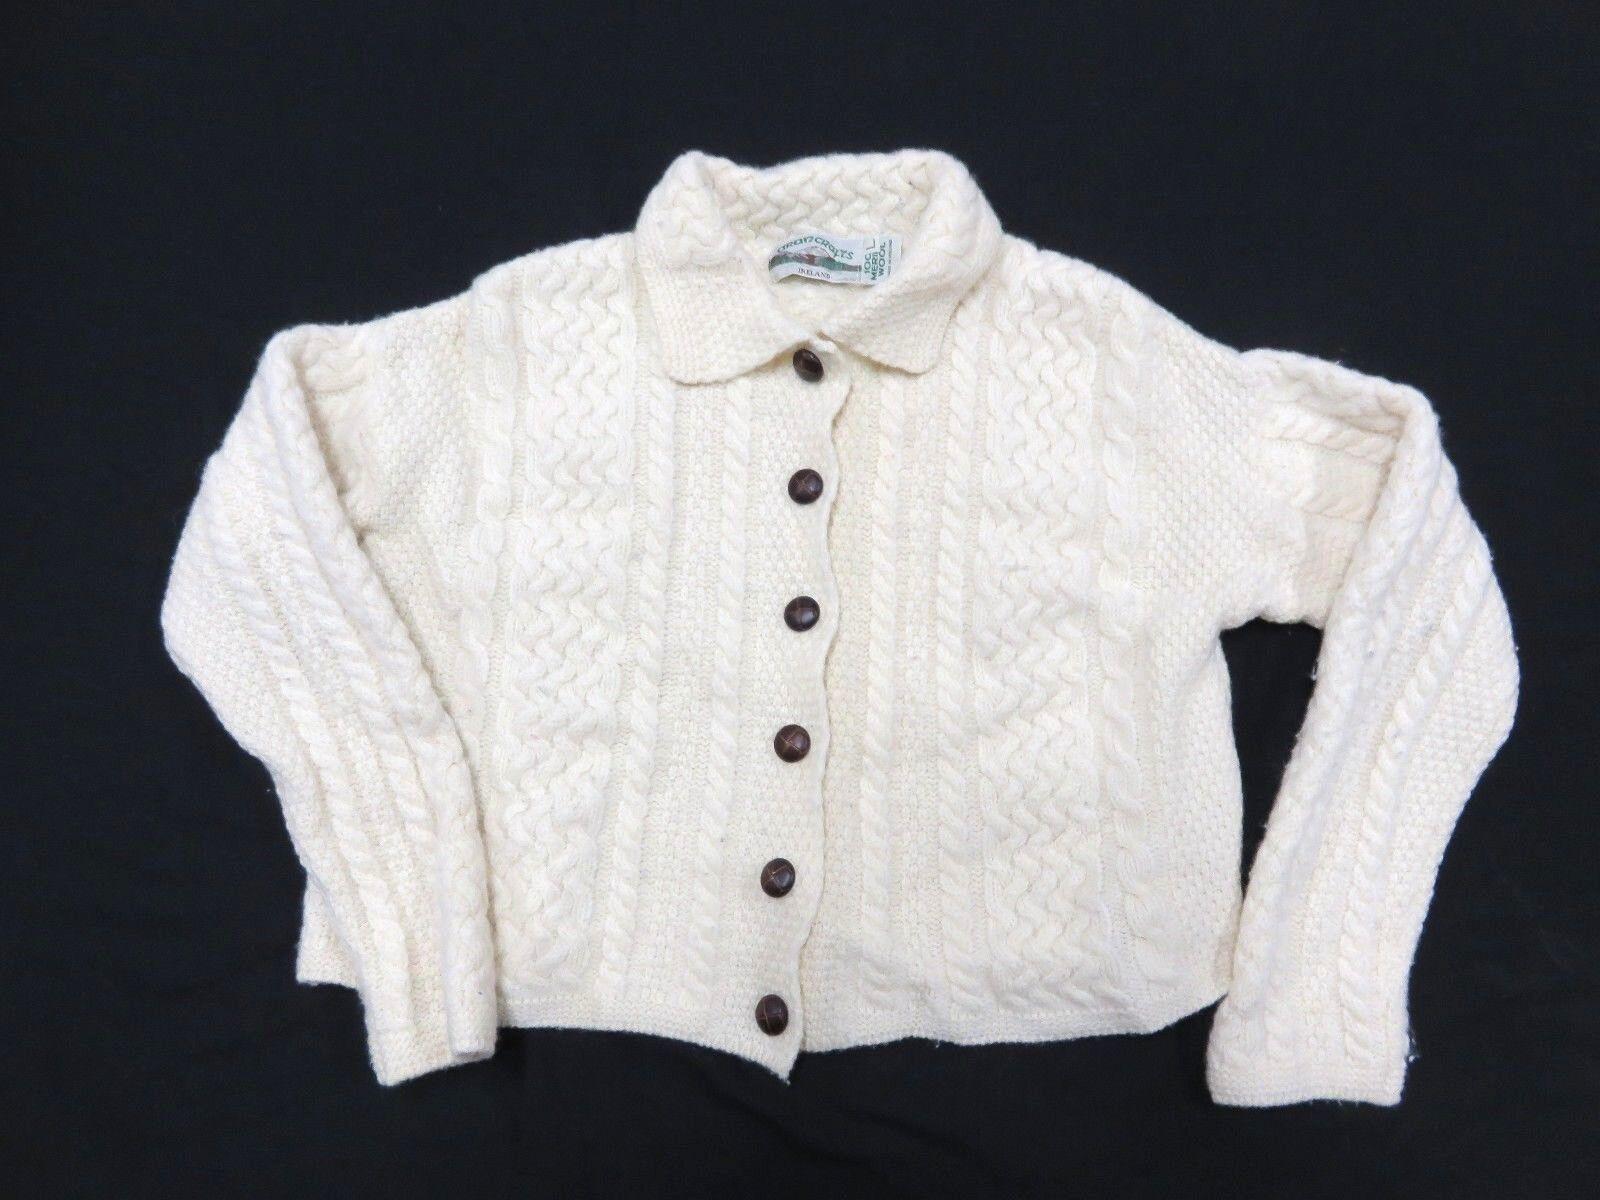 ARANCRAFTS 100% Merino Wool Knit Button Up Sweater Adult Women's Size Large